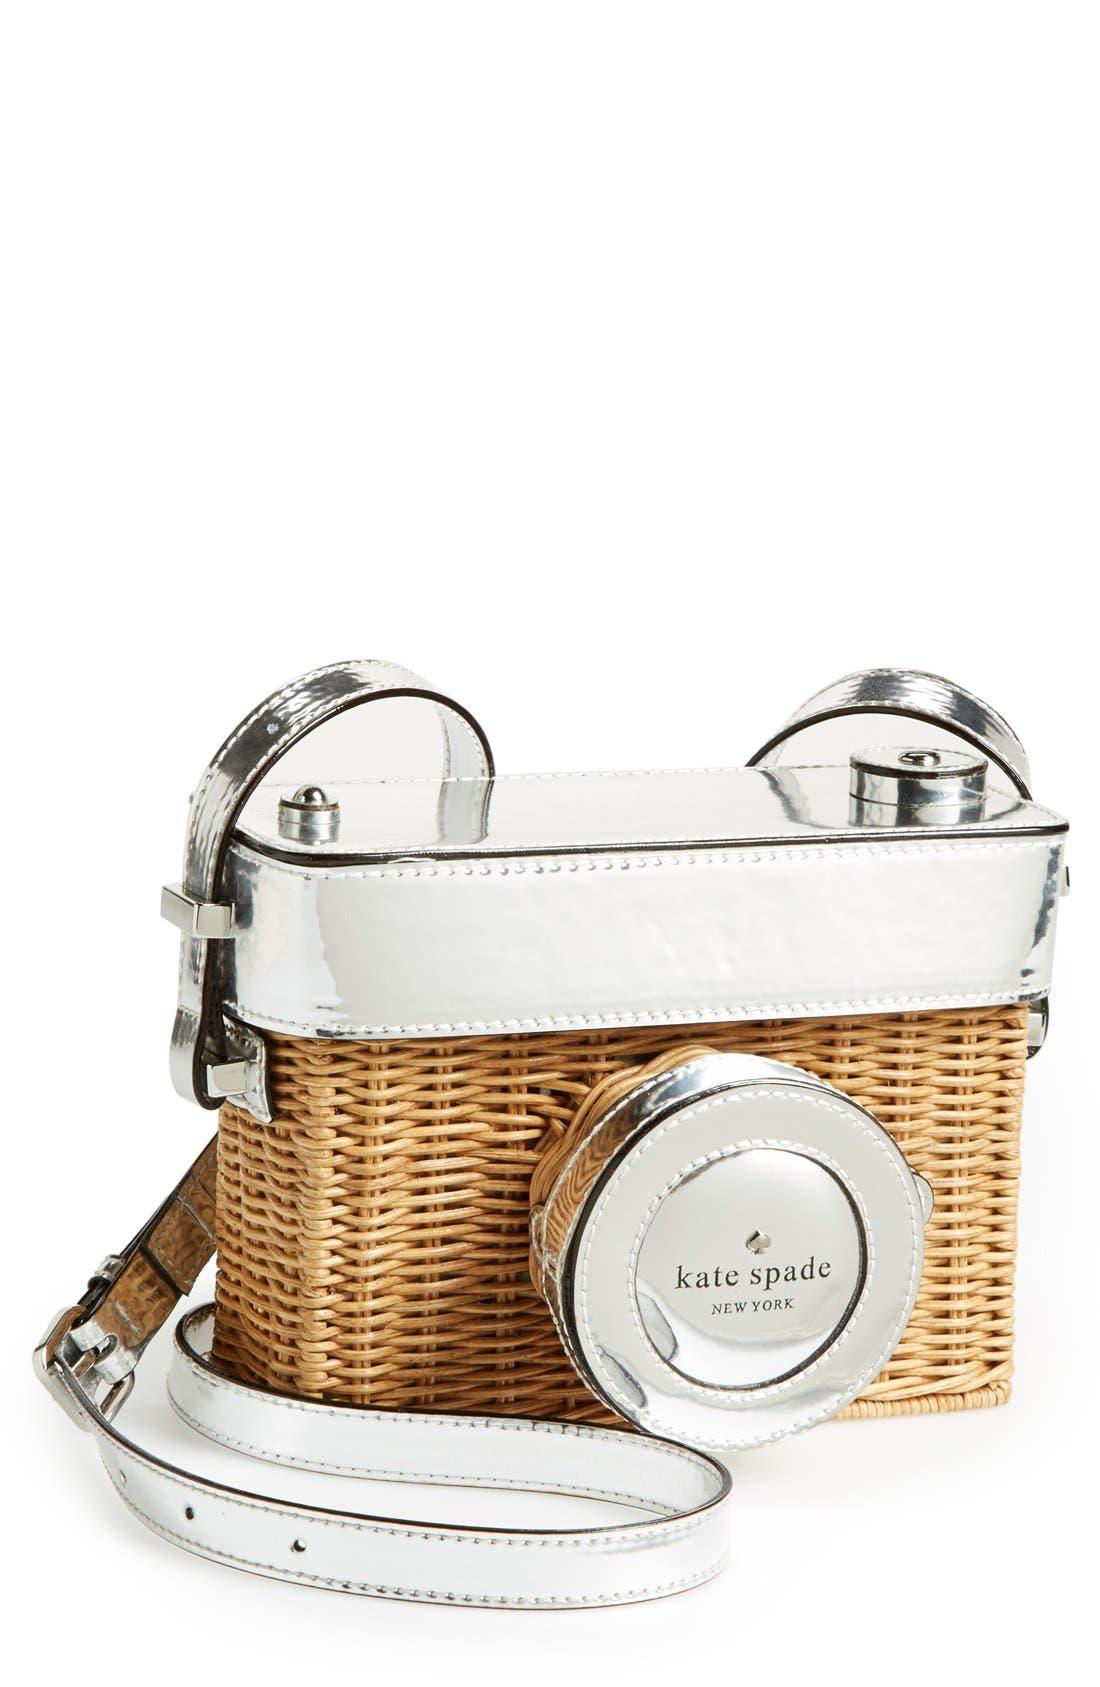 Main Image - kate spade new york 'grand tour' wicker camera shoulder bag